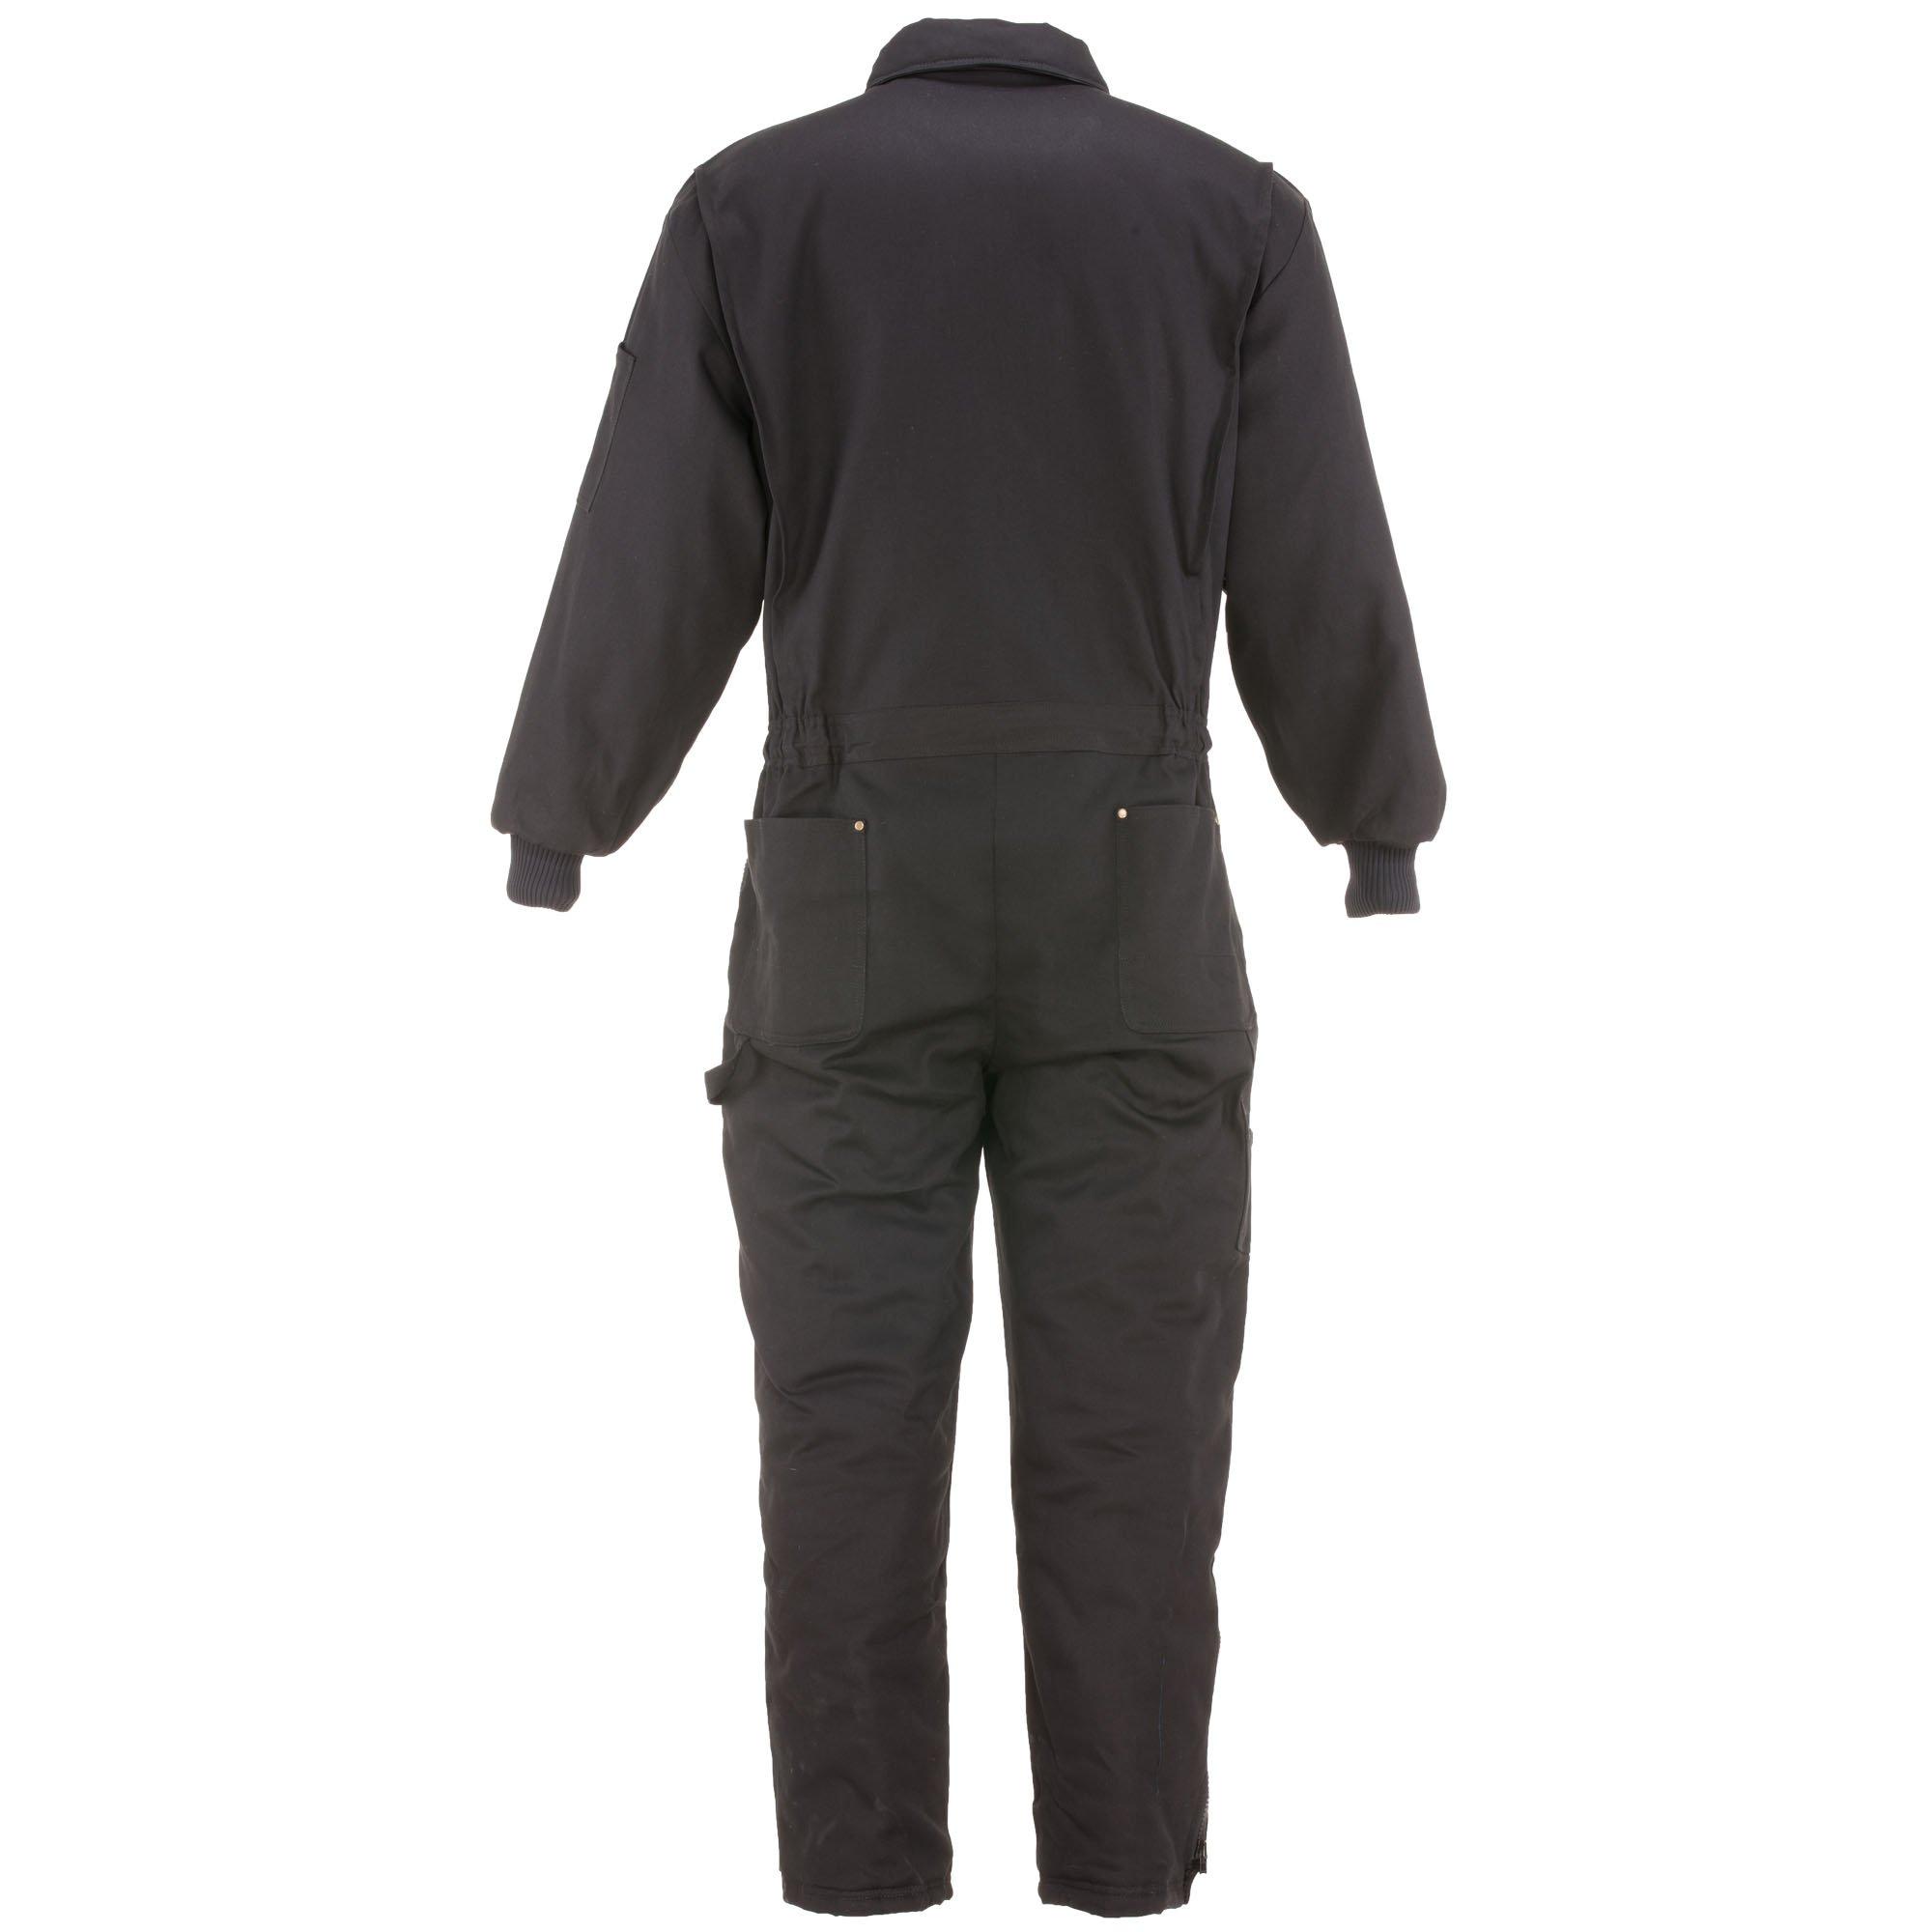 RefrigiWear Men's Water-Resistant Insulated Denim Comfortguard Coveralls (Black, XL) by RefrigiWear (Image #2)